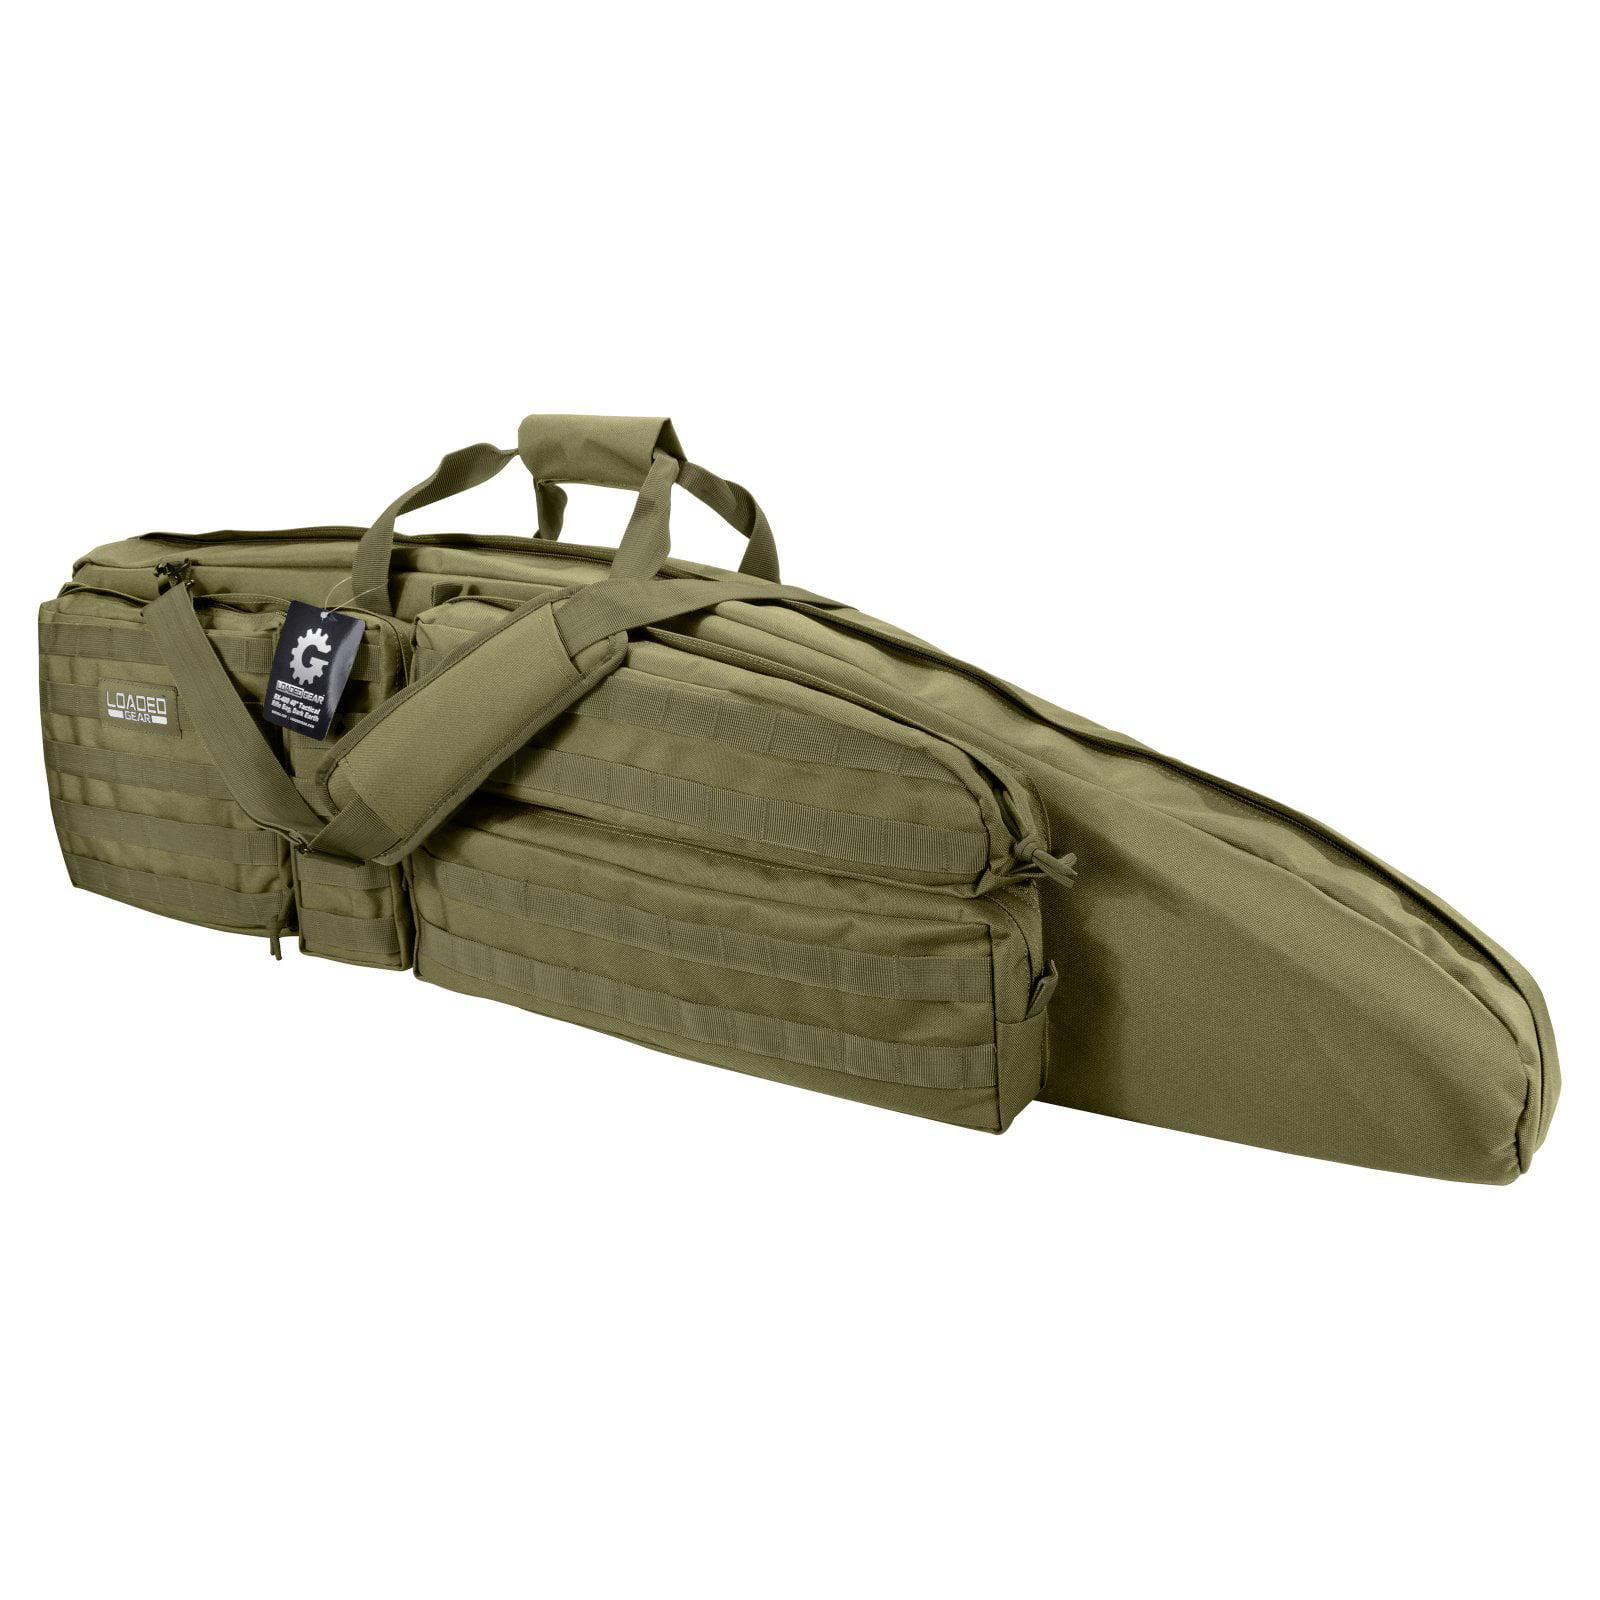 "Barska Optics Loaded Gear RX-400 48"" Tactical Rifle Bag, Green"